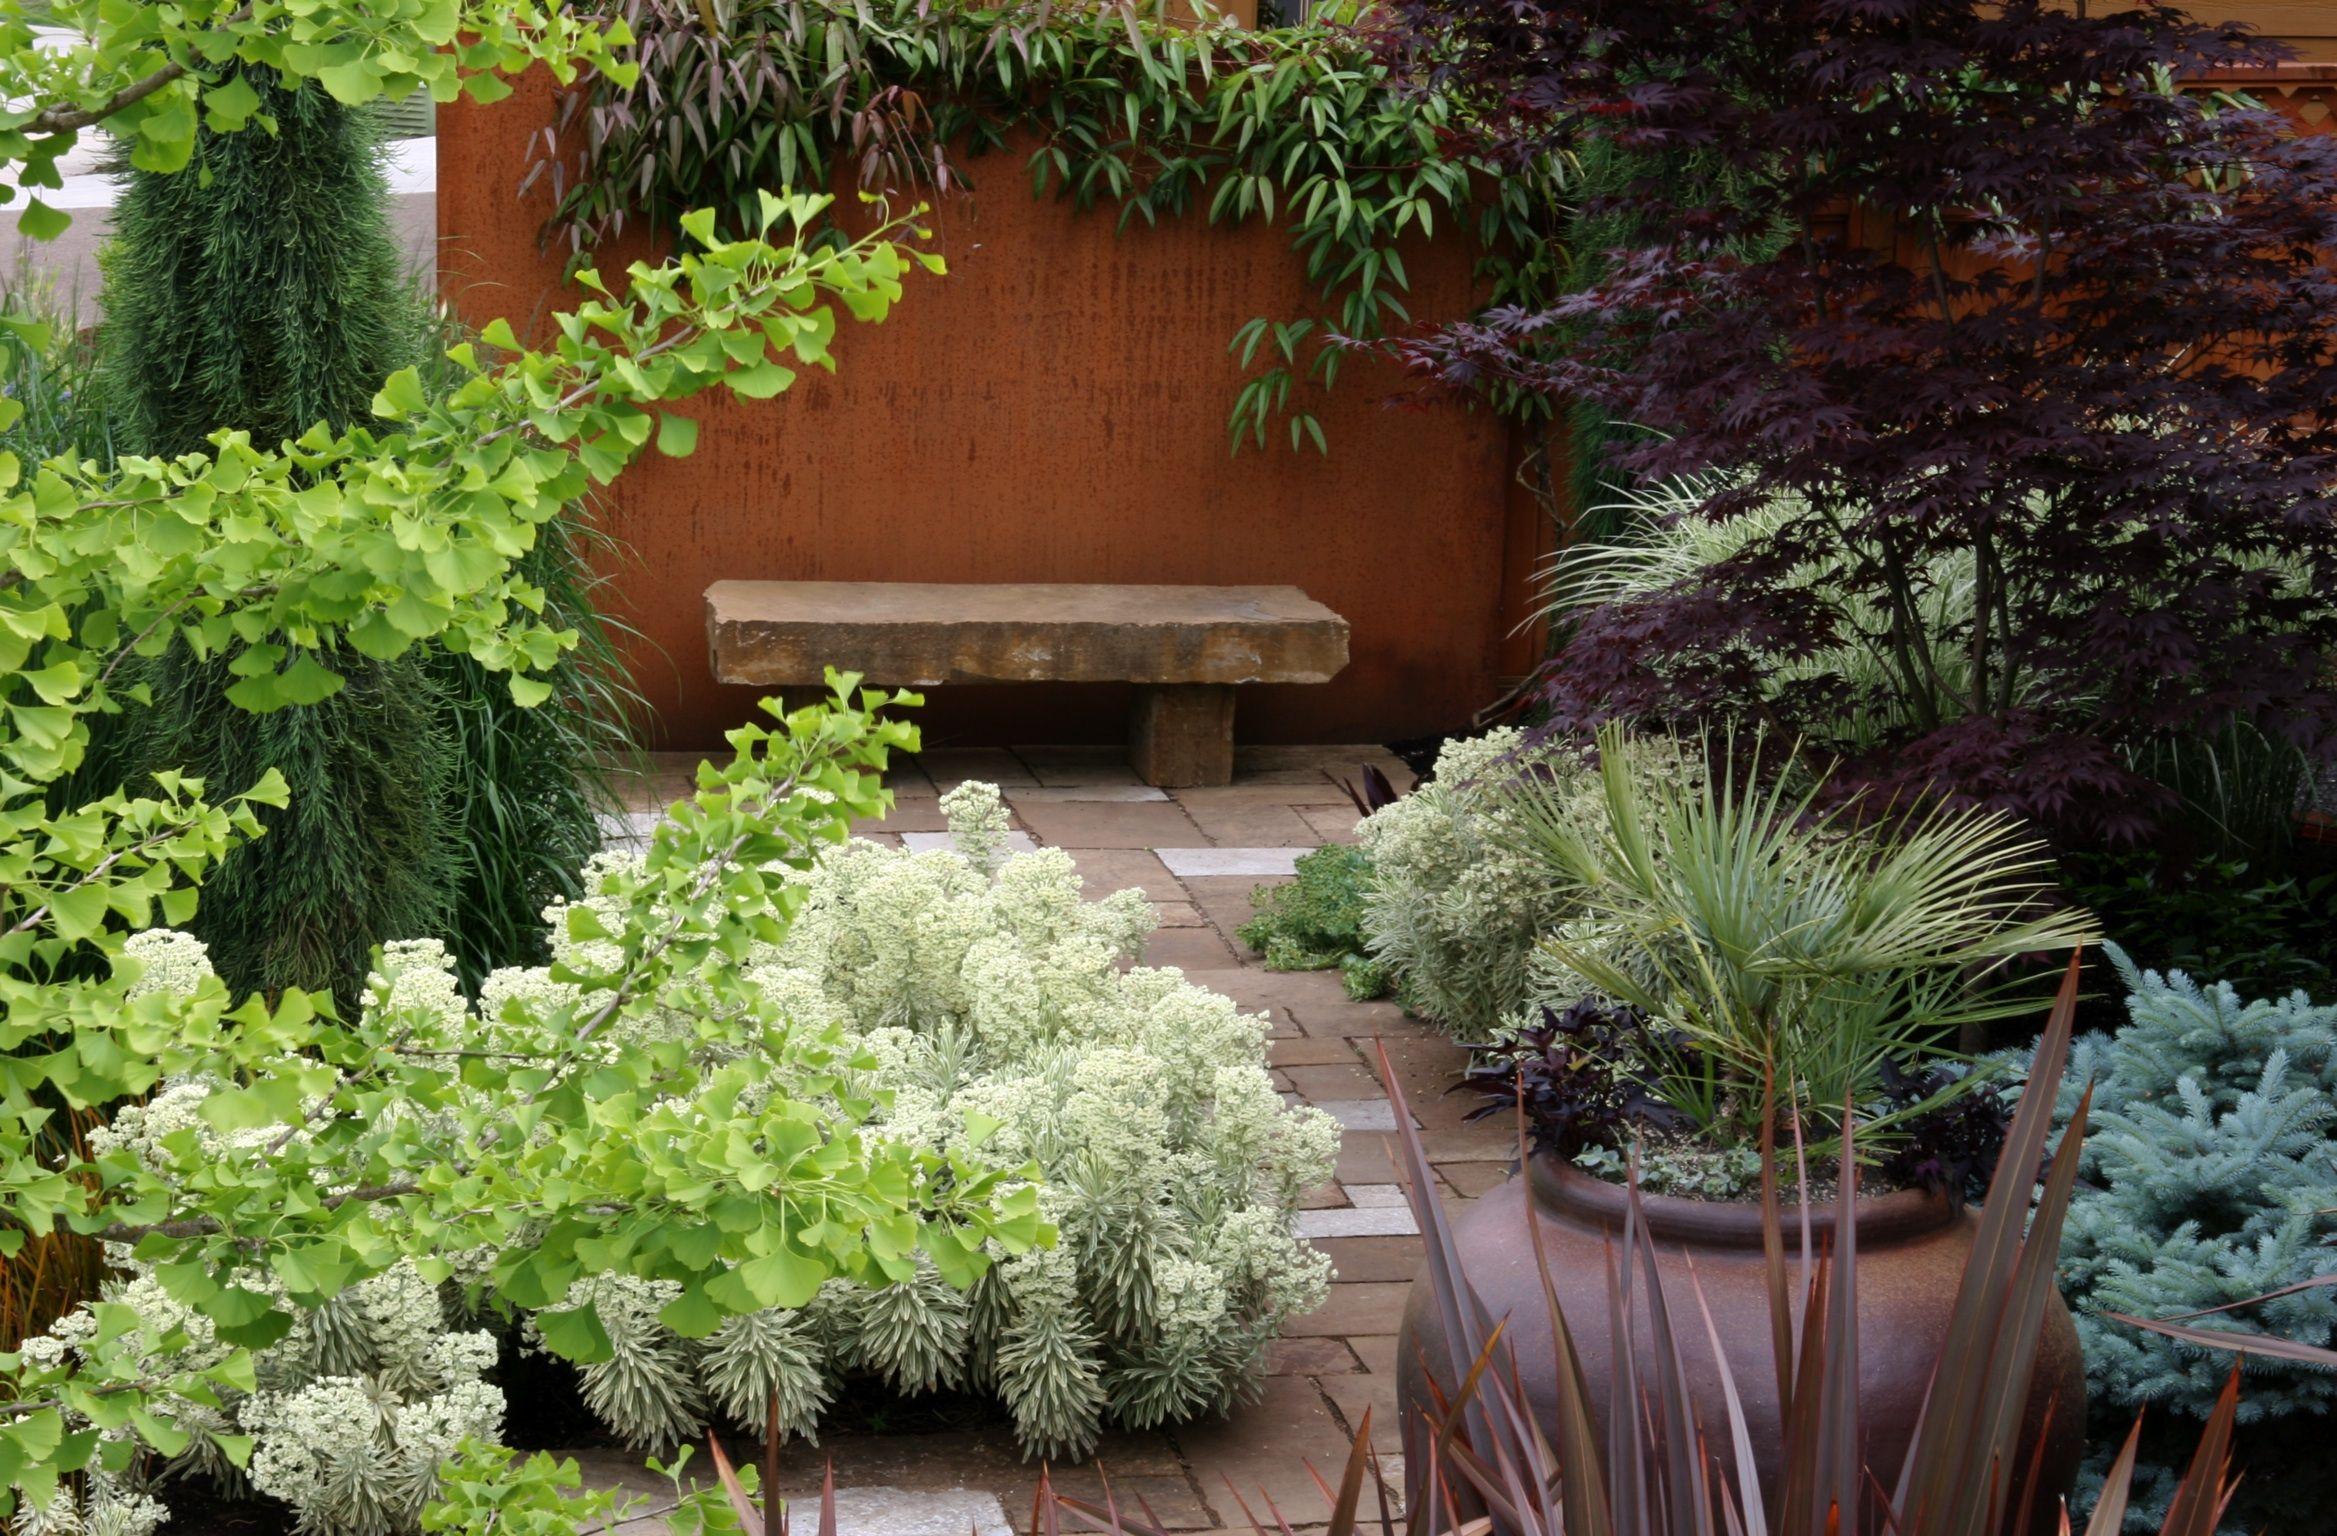 Home garden design flower  quite a lot going on with rust wall reliefMOSAIC GARDENS